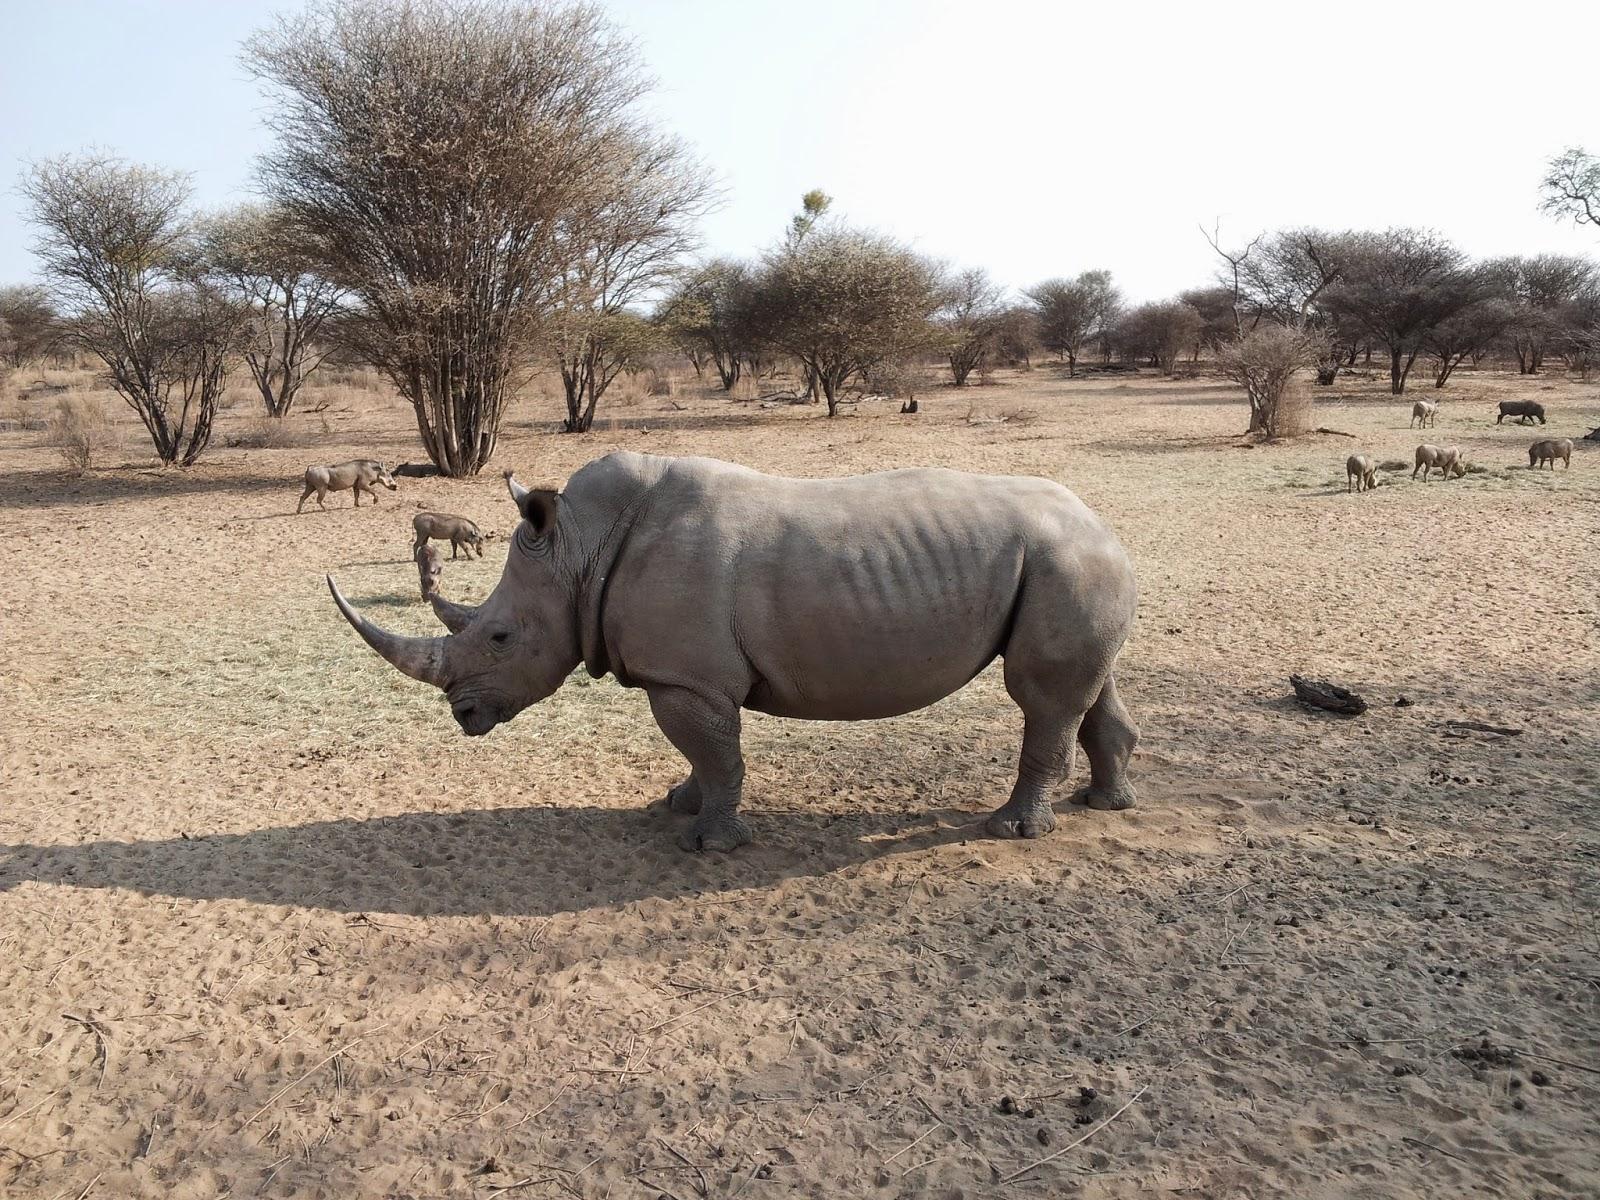 Namibian rhino - www.namibweb.com